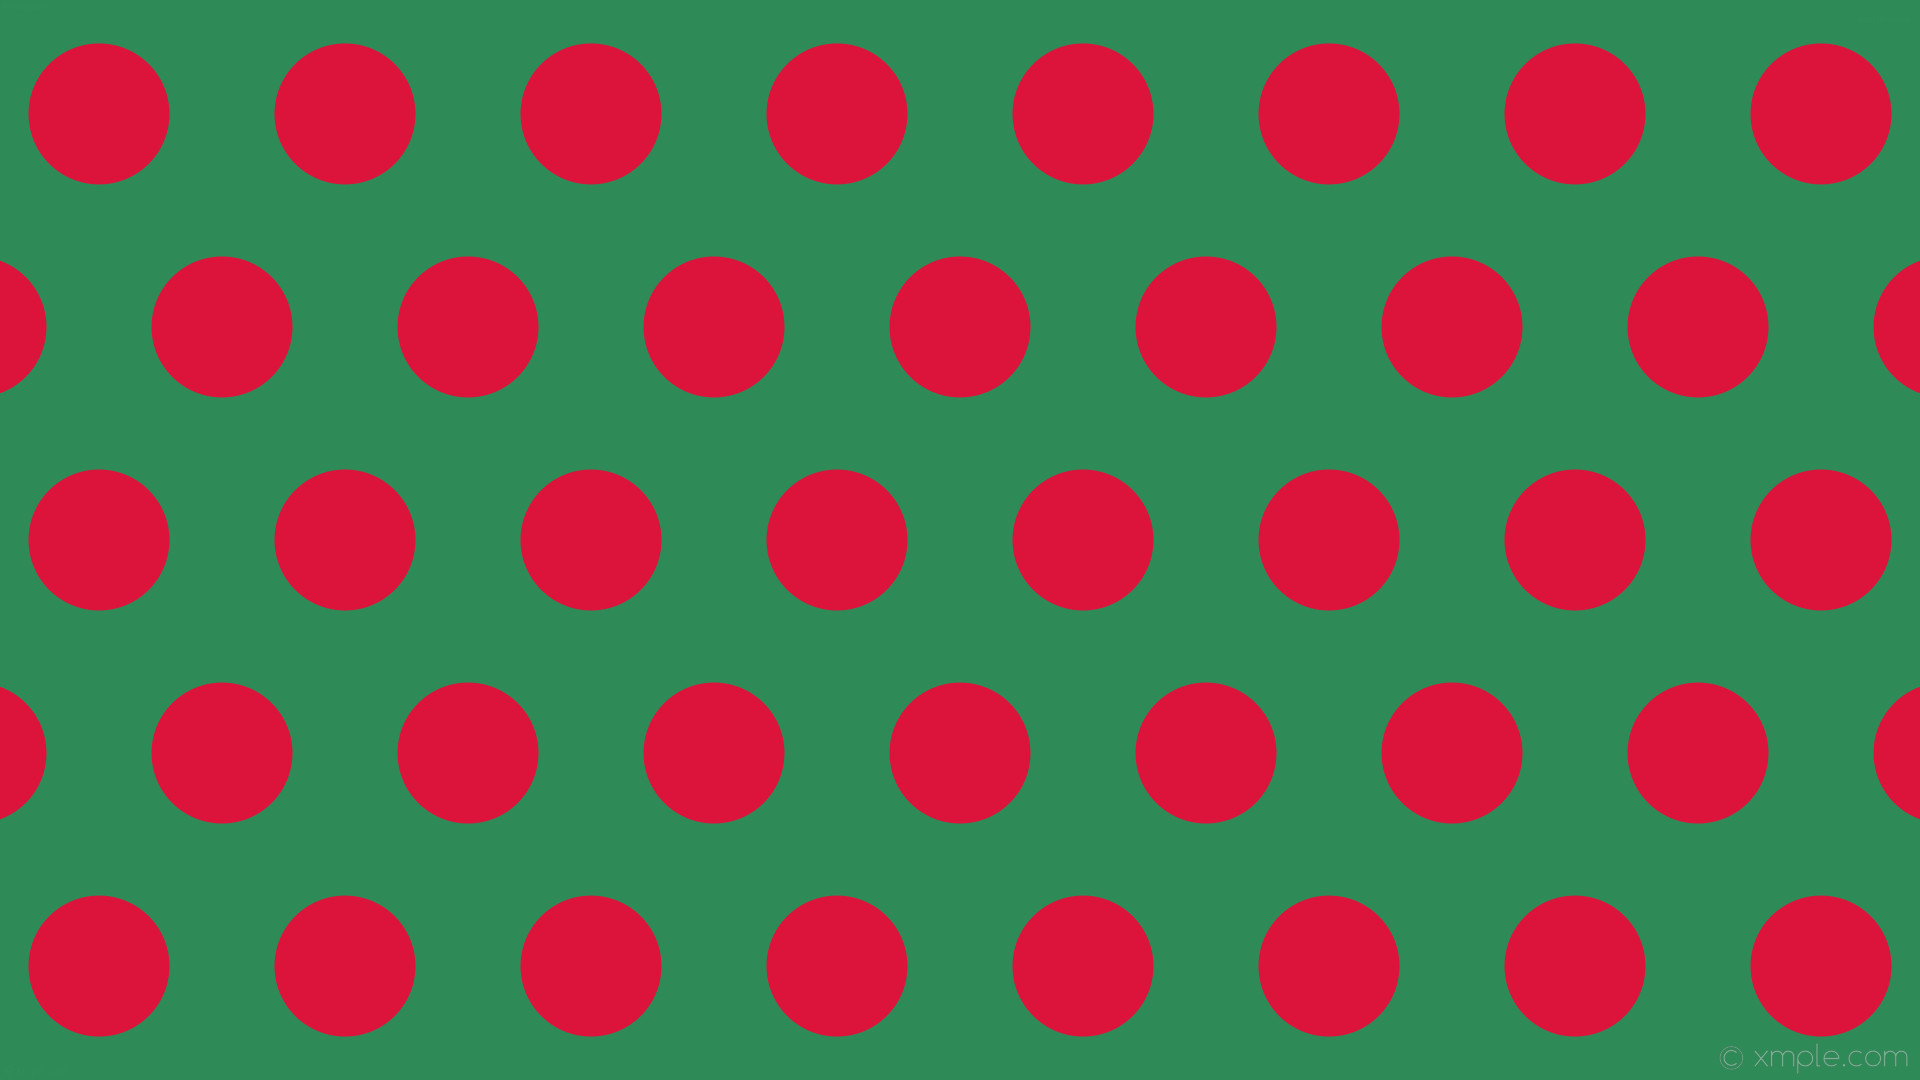 wallpaper red green polka dots hexagon sea green crimson #2e8b57 #dc143c 0°  141px